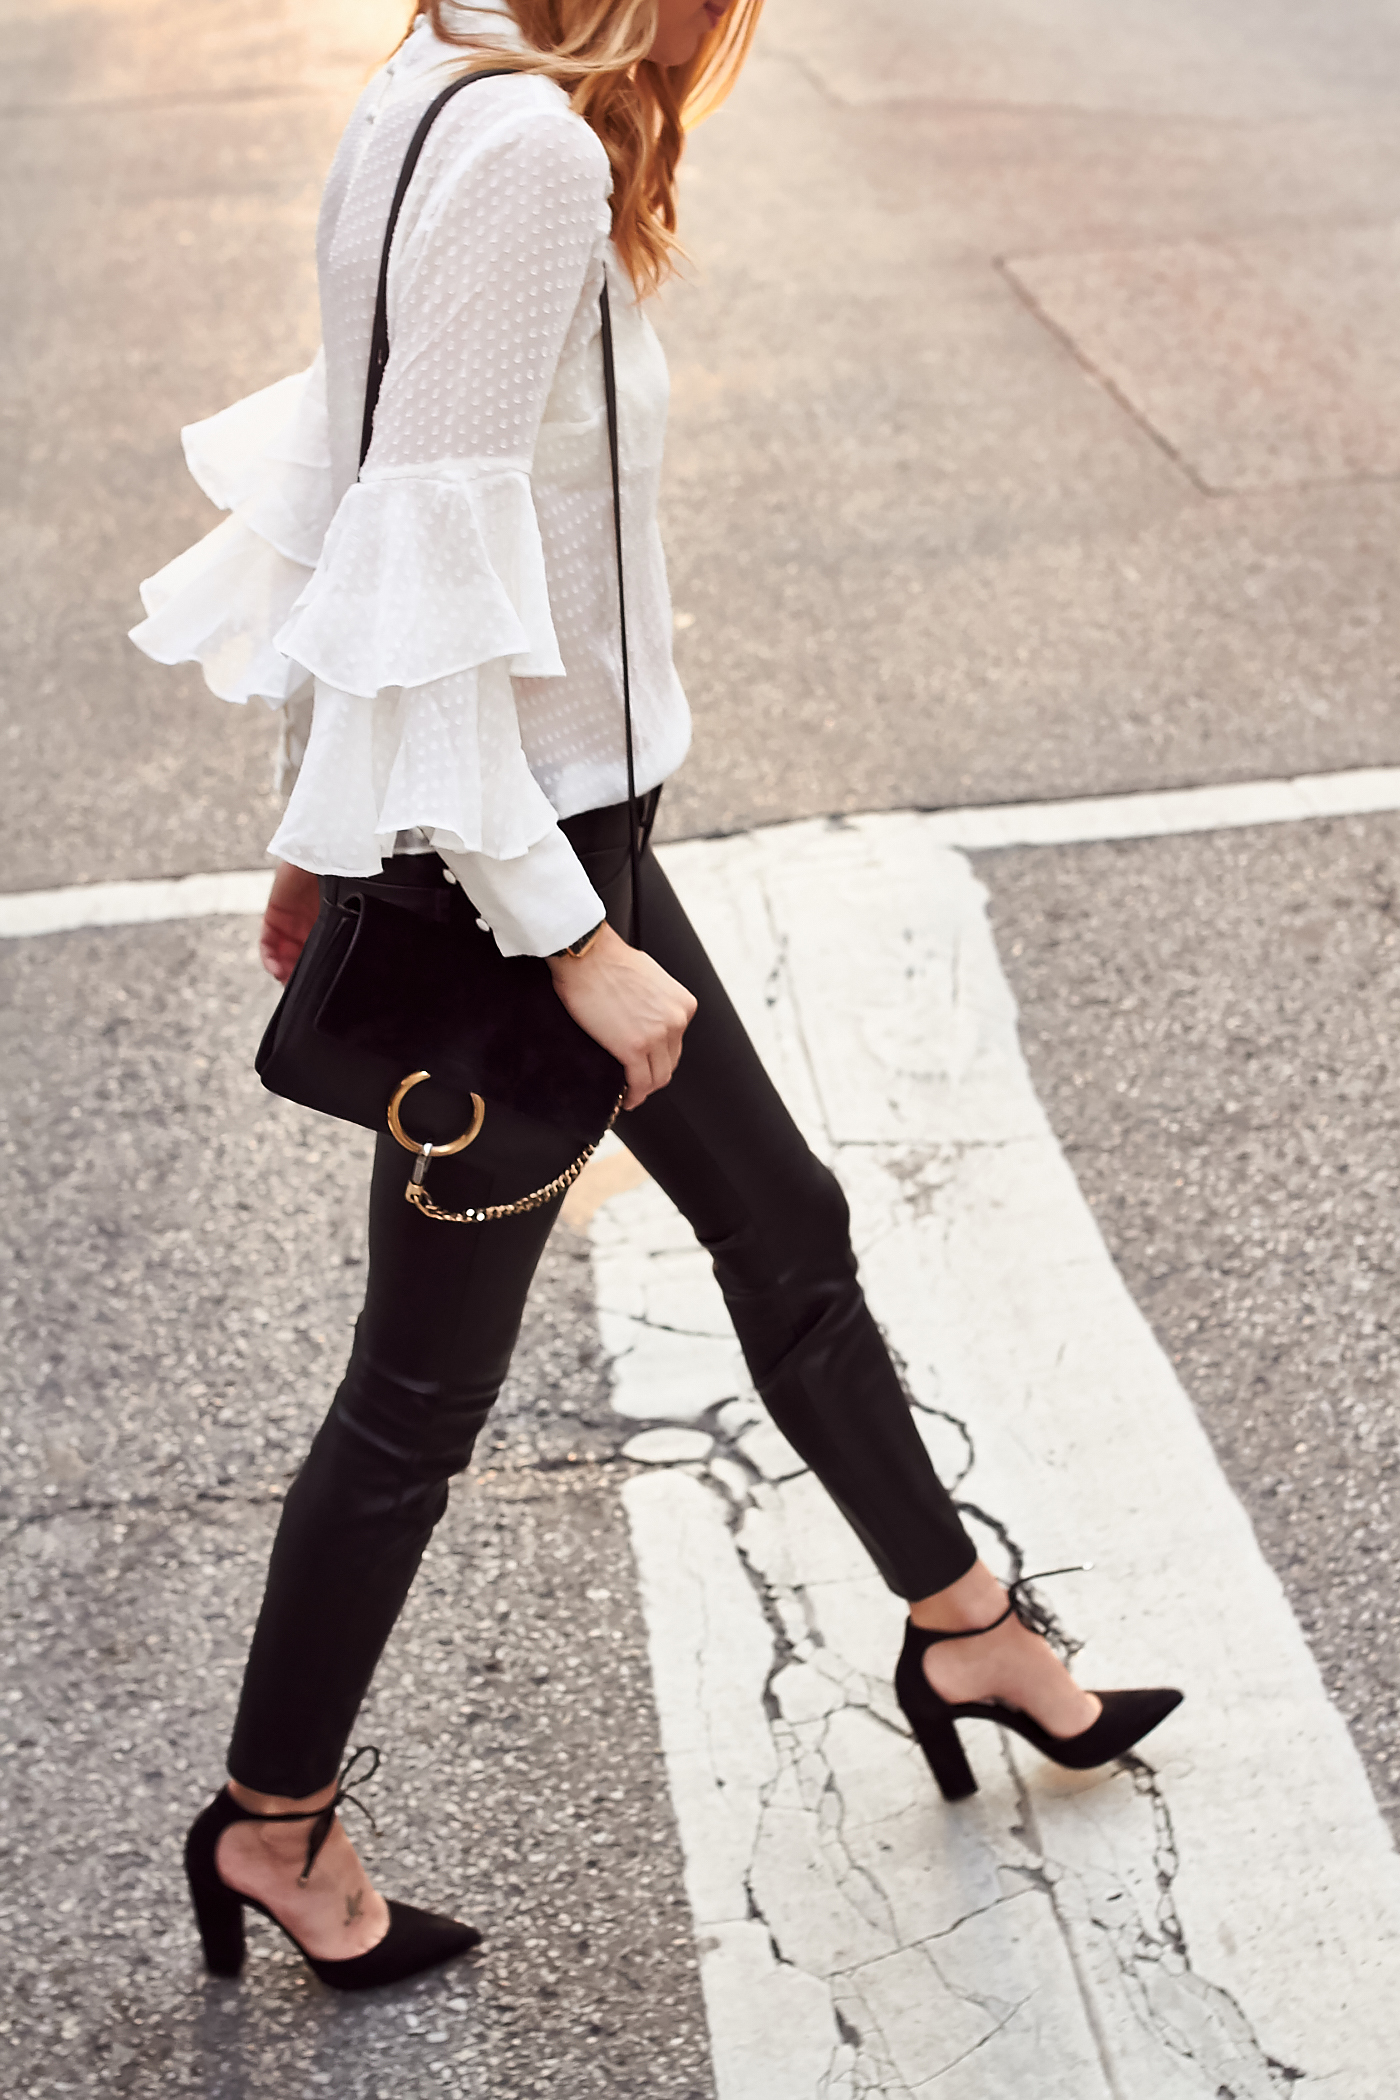 fashion-jackson-white-ruffle-sleeve-top-black-faux-leather-skinny-pants-chloe-faye-handbag-black-bow-pumps